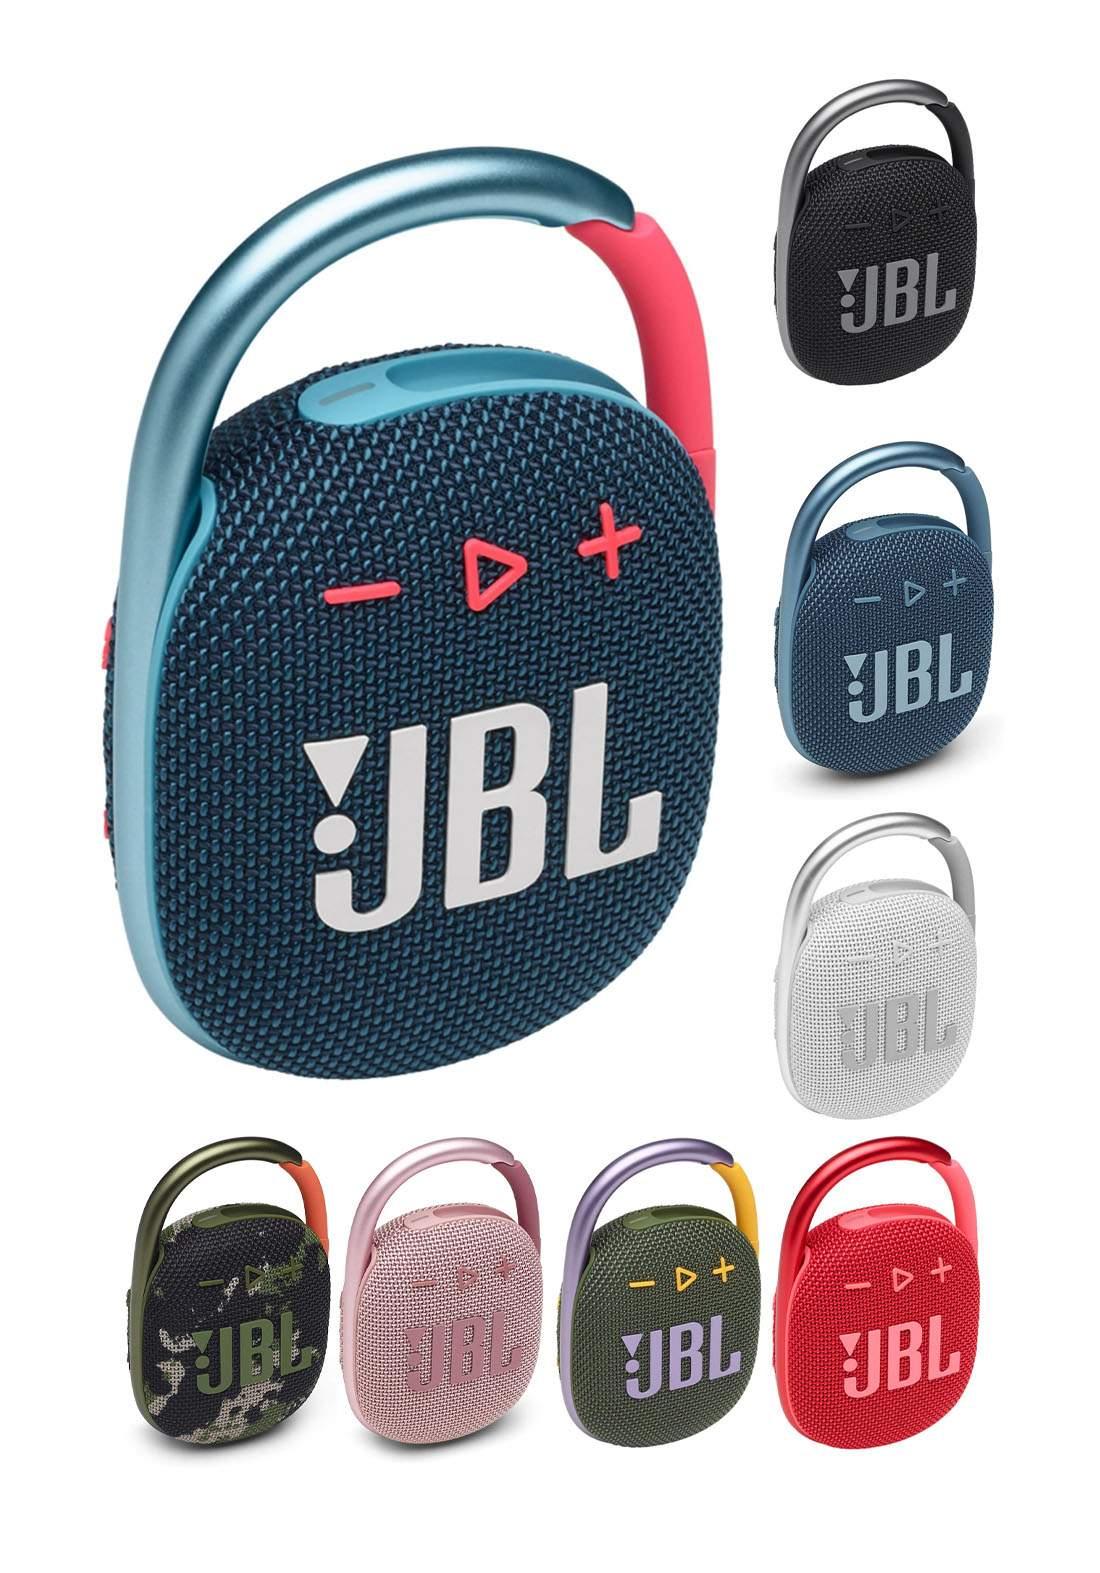 JBL Clip 4 Portable Bluetooth Speaker مكبر صوت